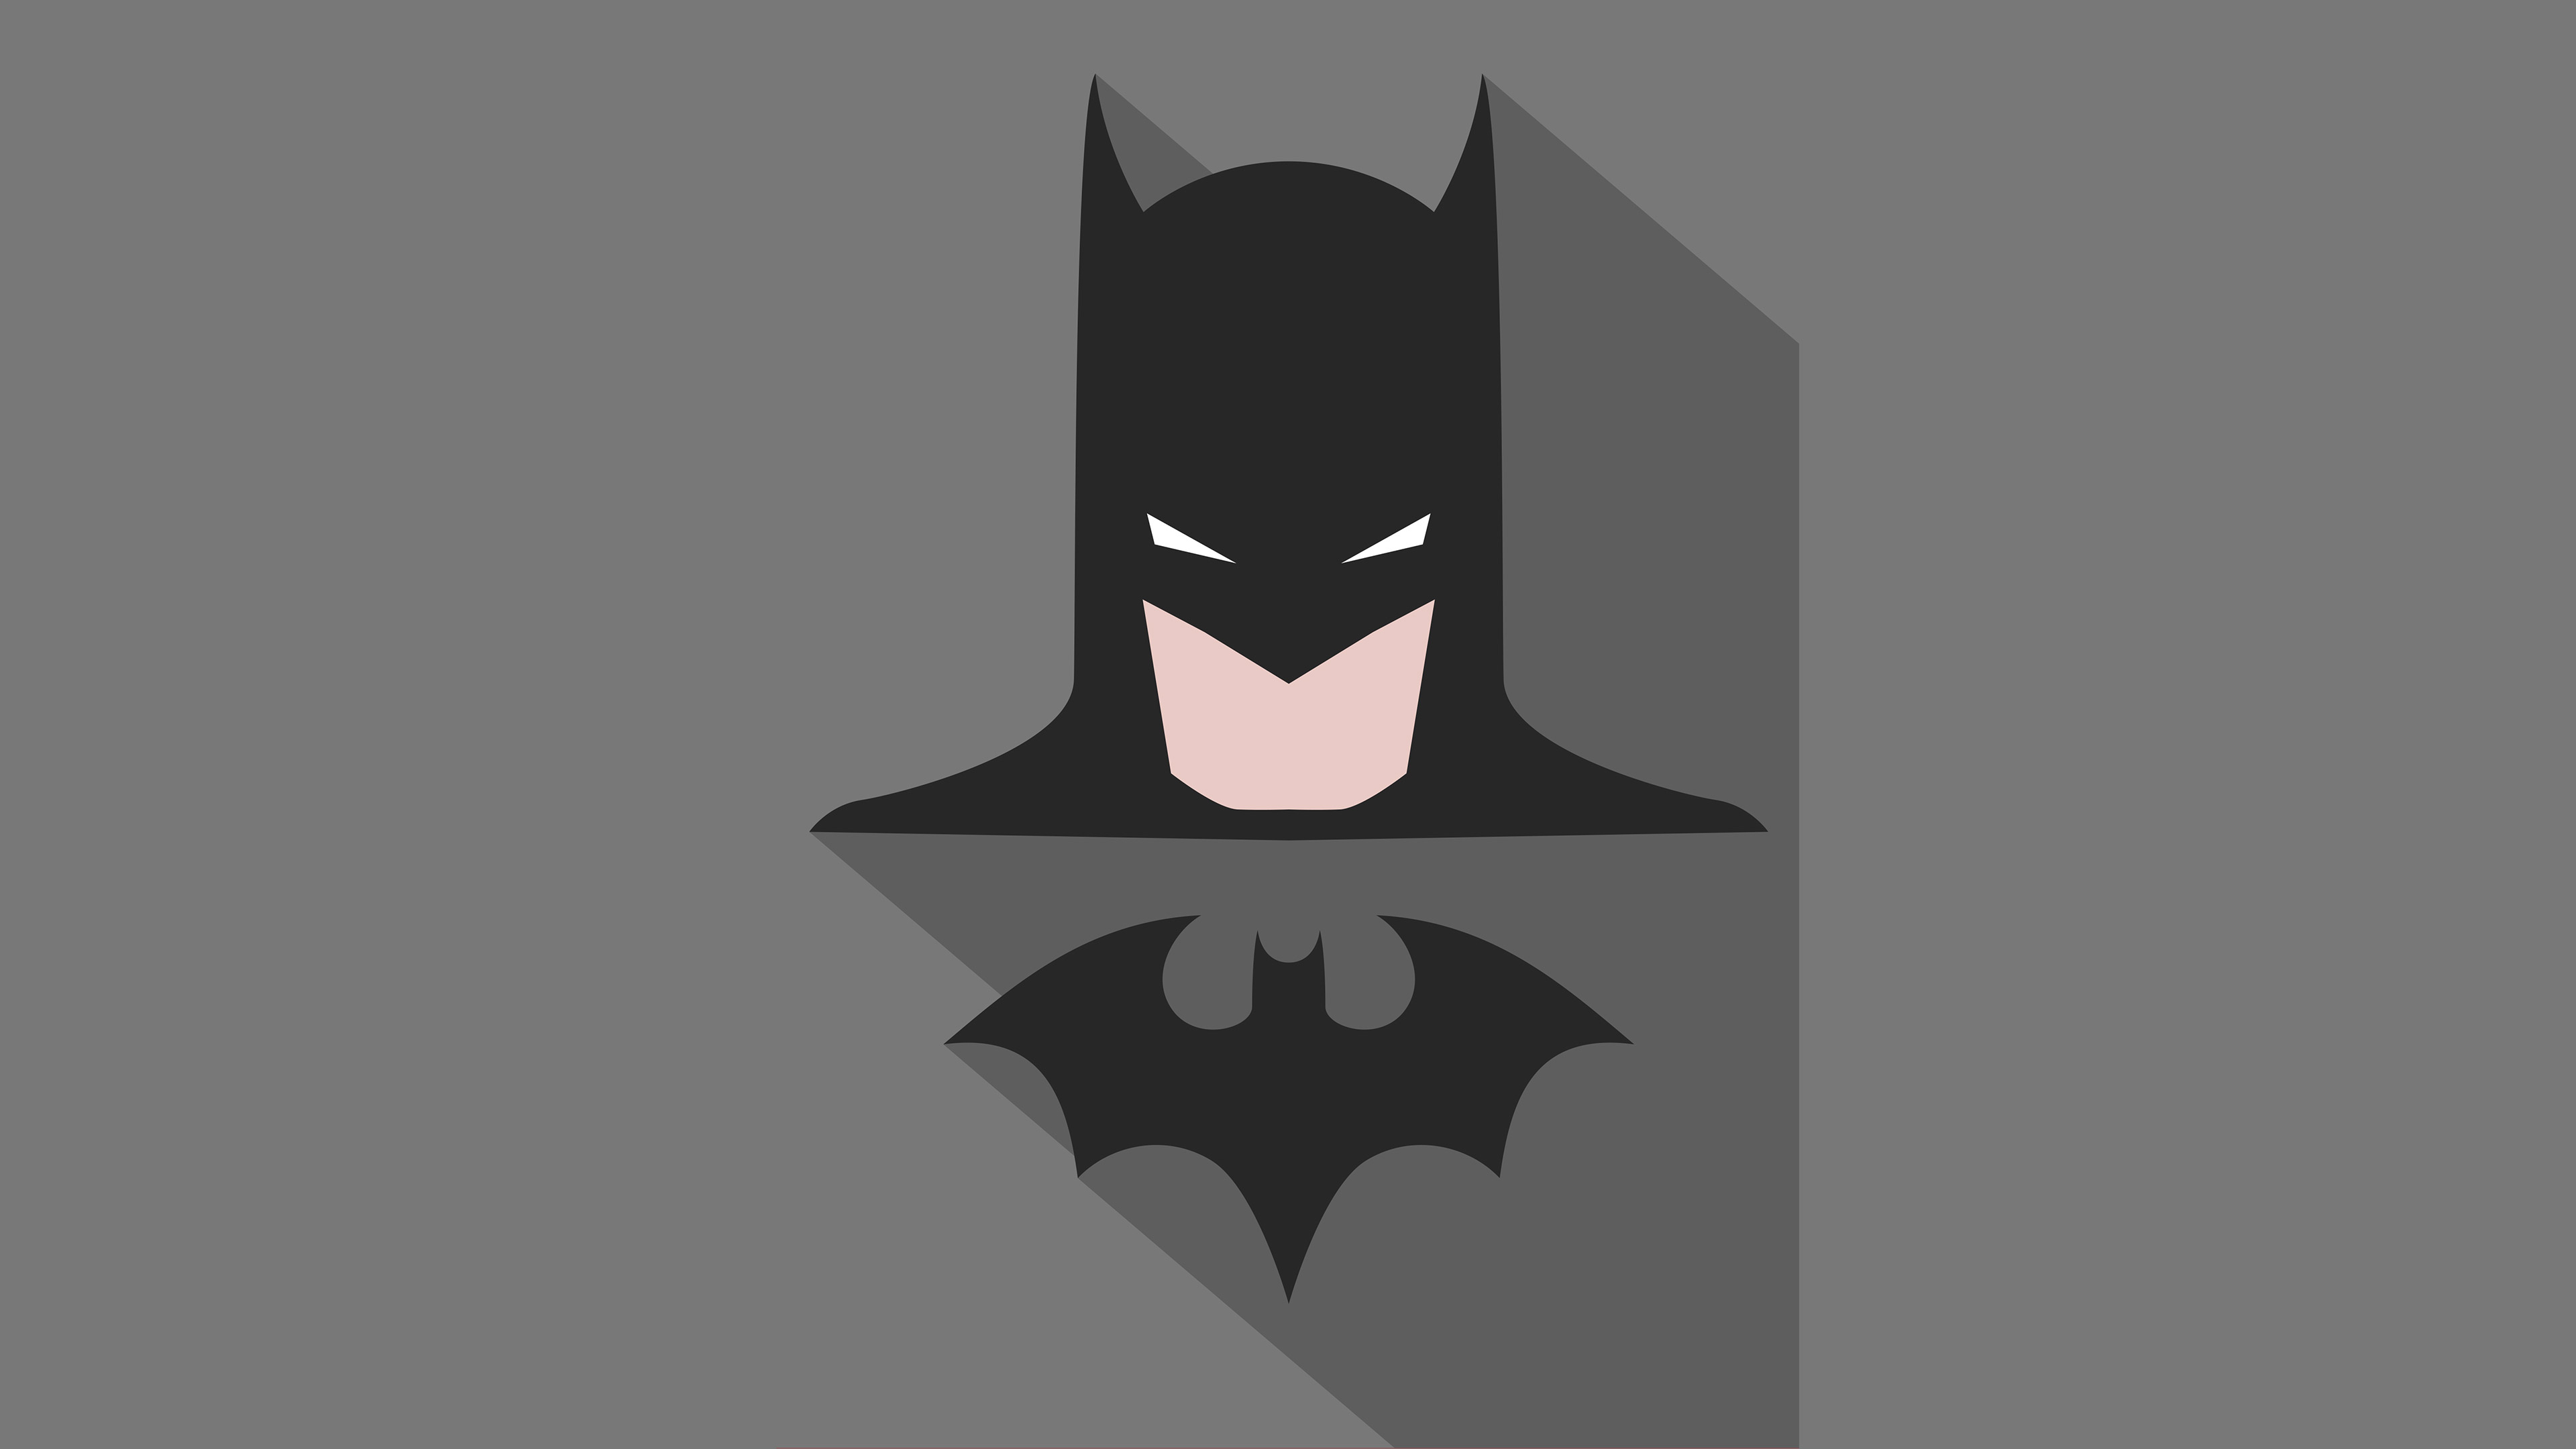 Batman Minimalism Poster Hd Superheroes 4k Wallpapers Images